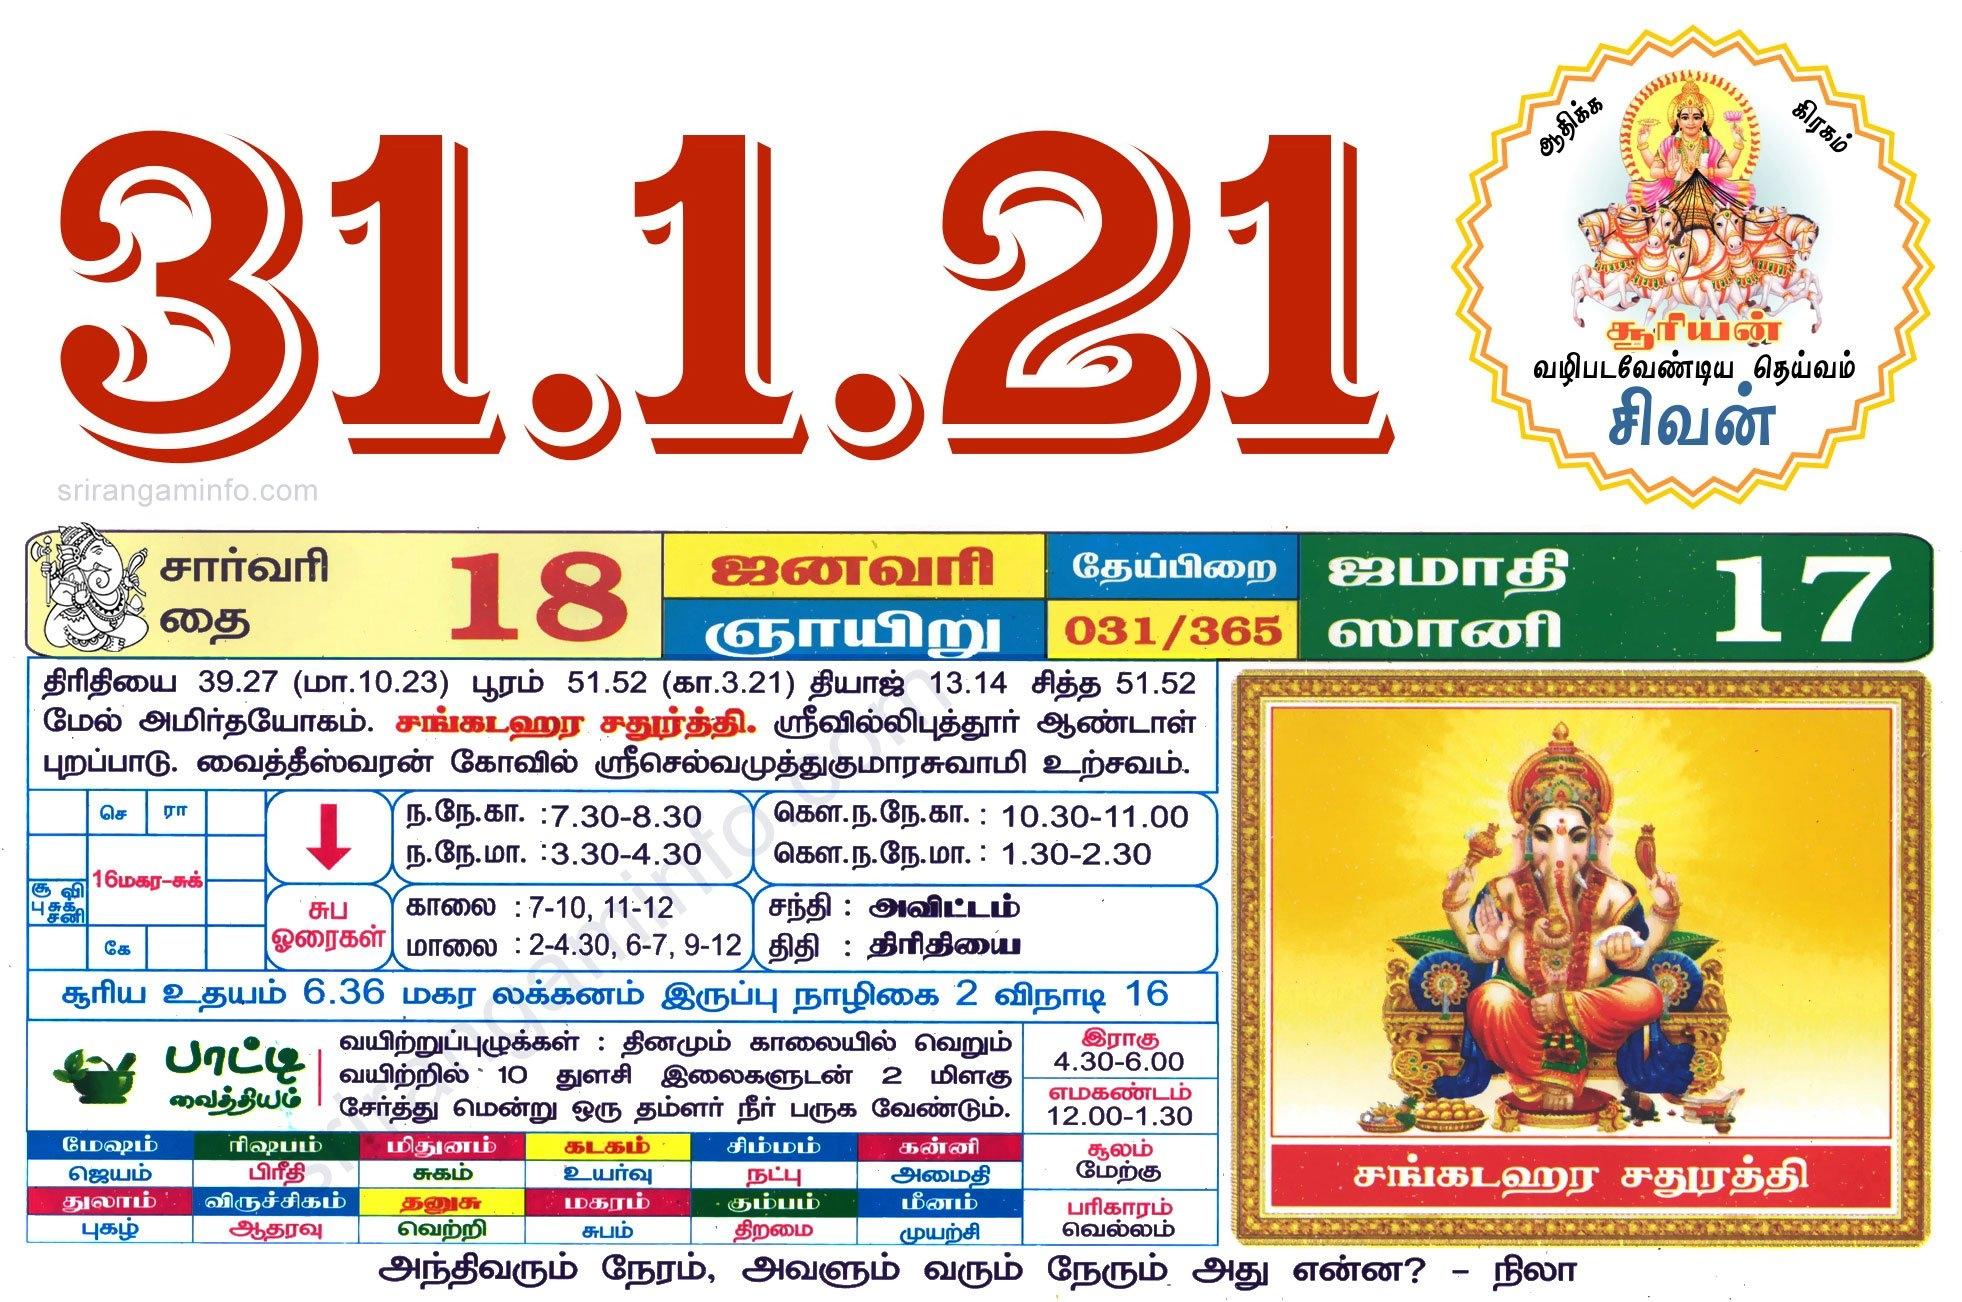 Tamil Daily Calendar 2021, Tamil Calendar 2021, Nalla Neram - தமிழ் தினசரி காலண்டர் for 2021 Tamil Calendar Holidays Image